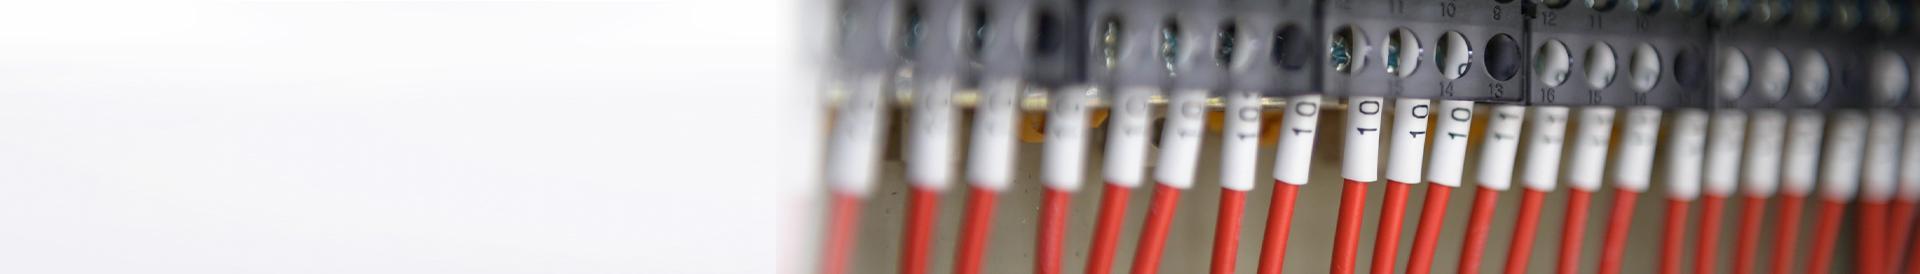 podpięte kable